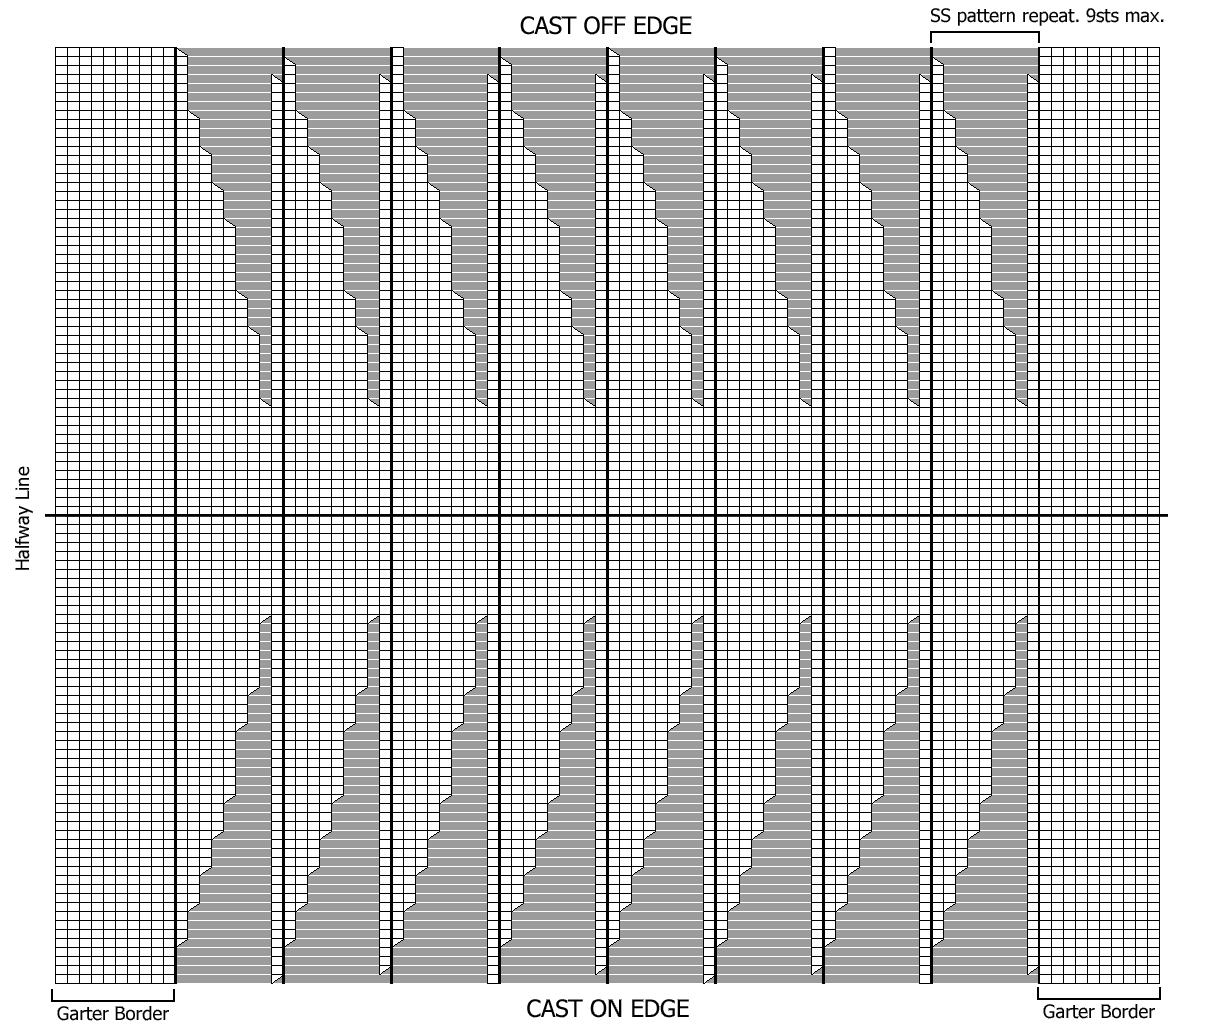 ODDknit - Free Knitting Patterns - Side-to-Side Hat